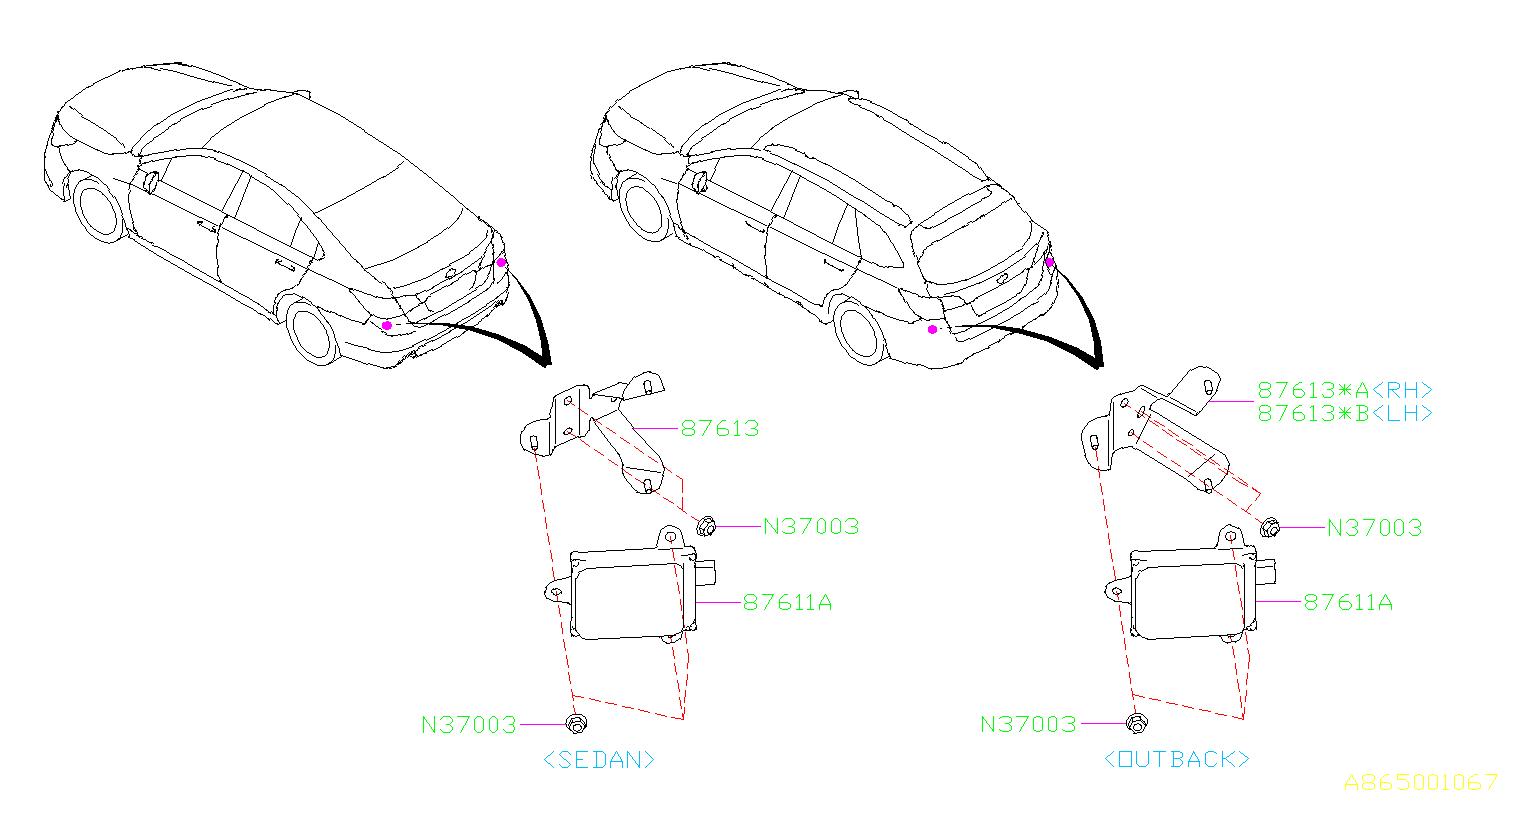 Subaru Outback Radar Assembly Back And Side System Rcta